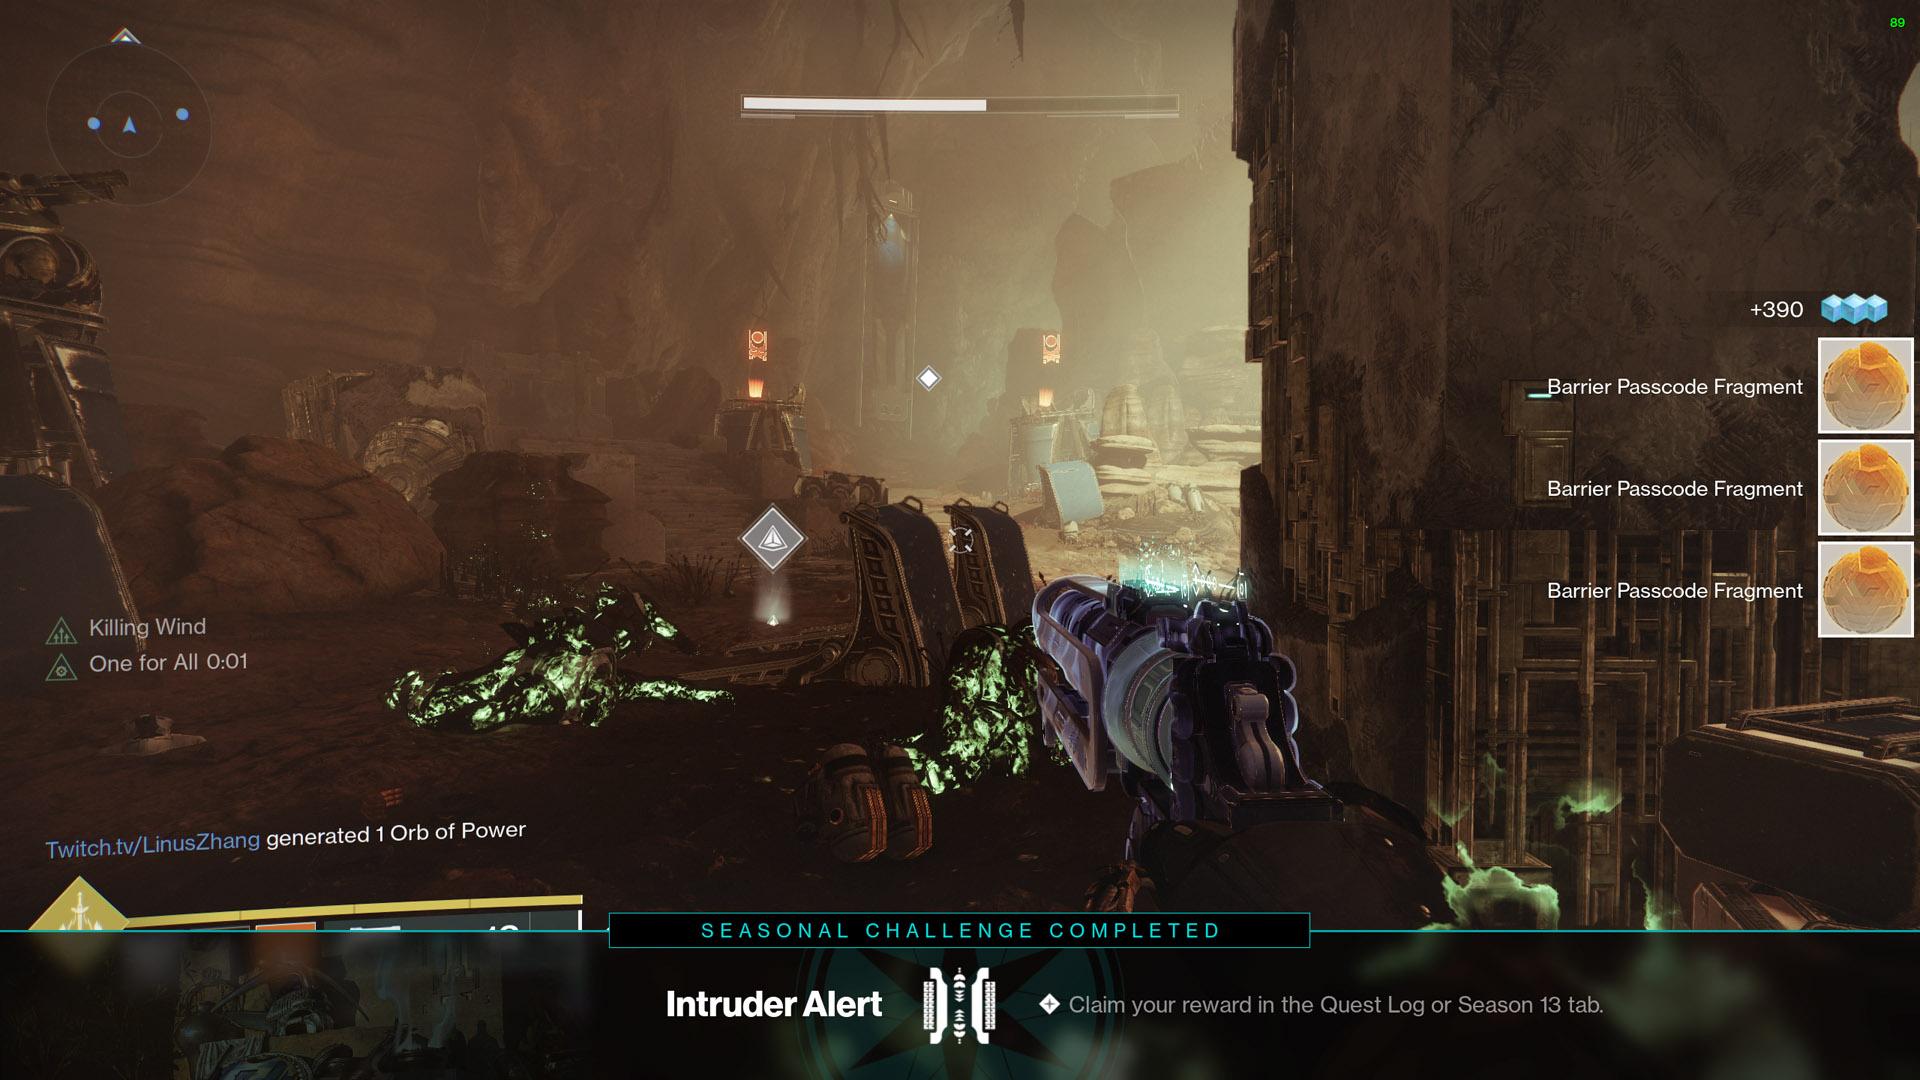 destiny 2 intruder alert